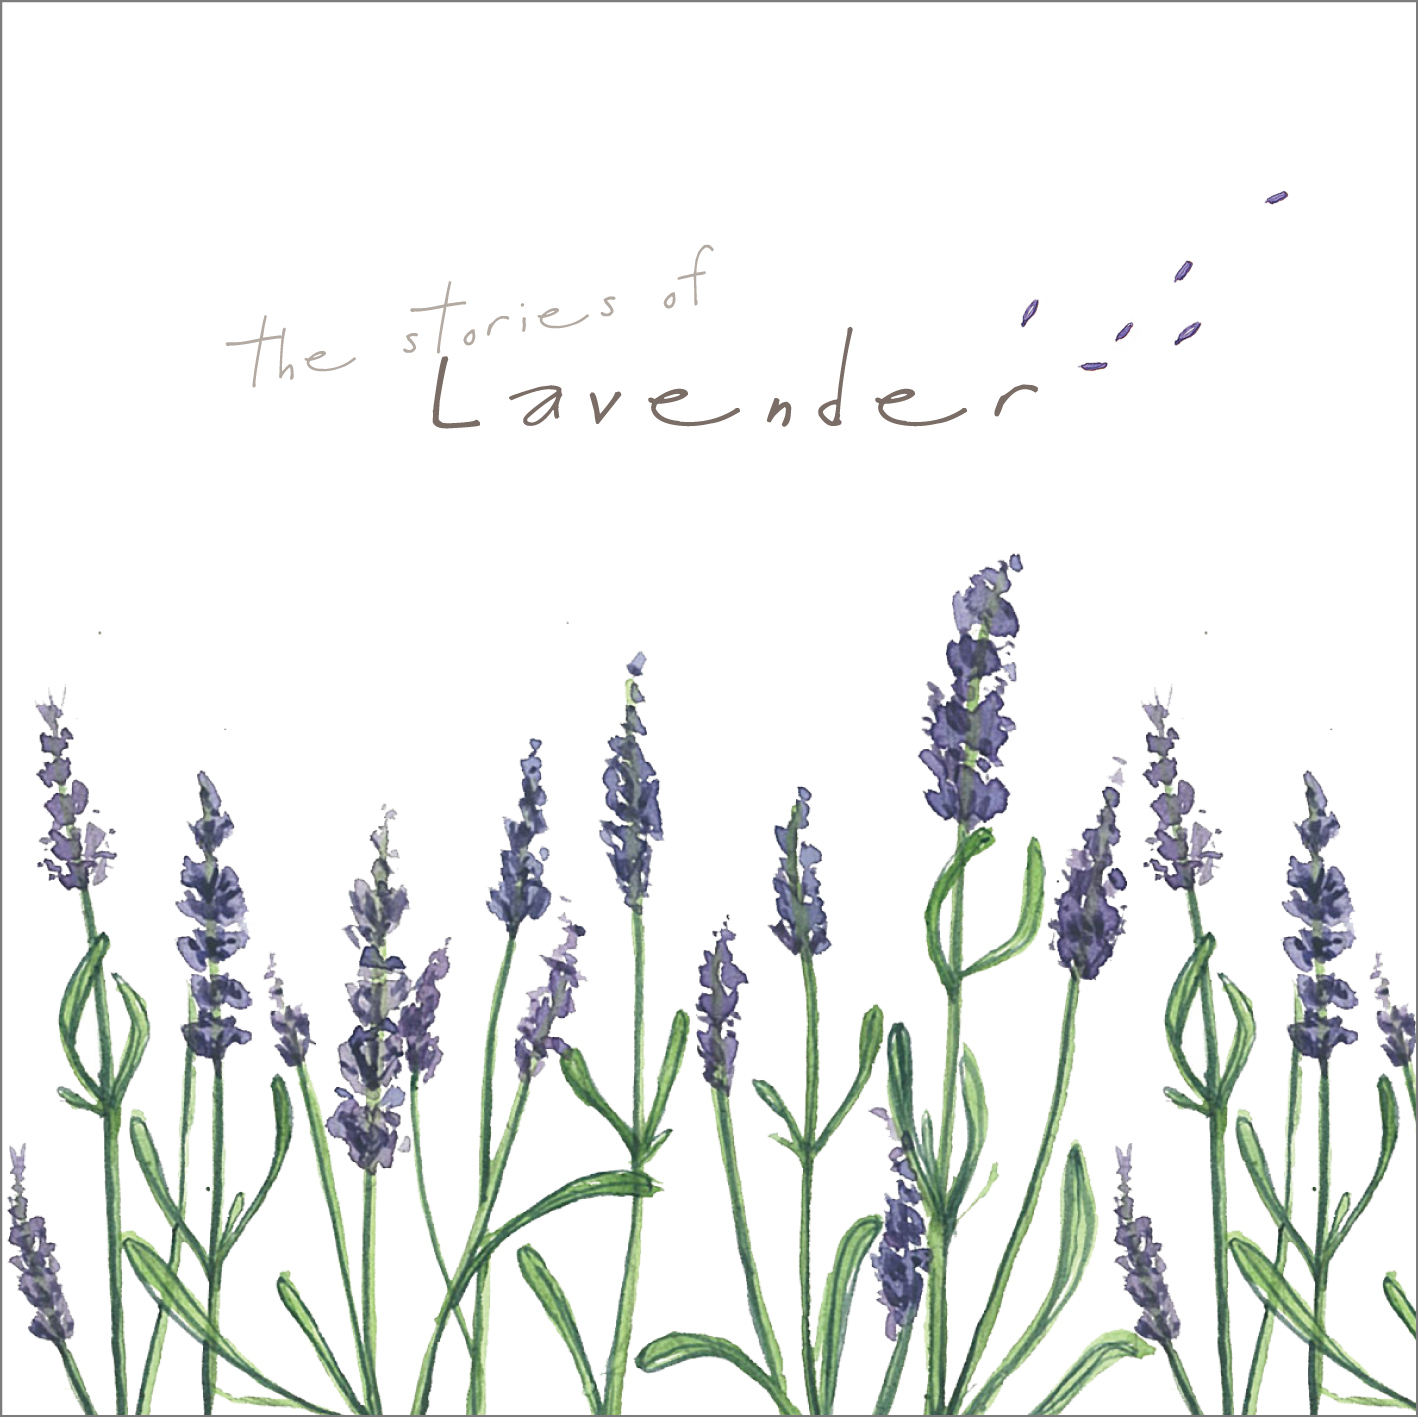 Lavender Talks